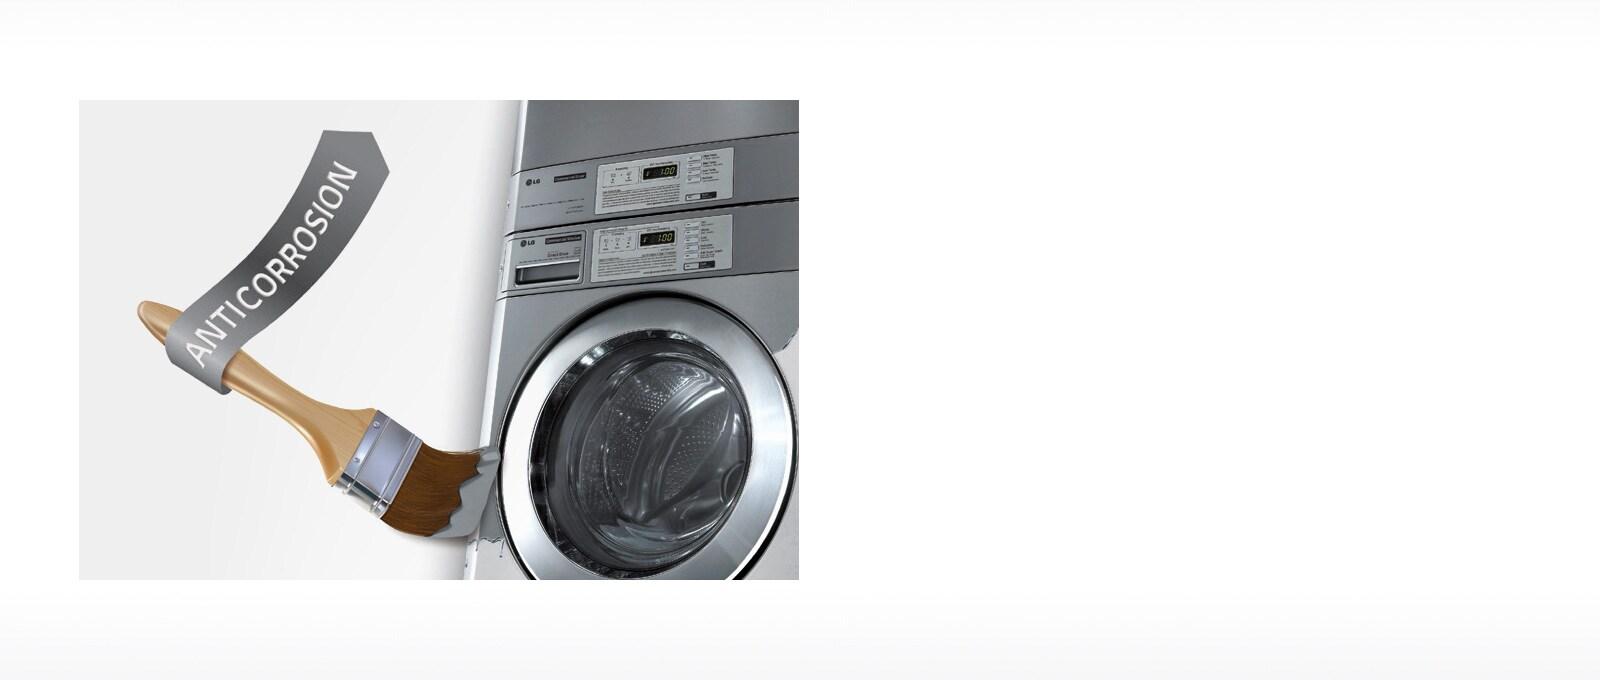 Giant C Washing Machine: Commercial Laundry Equipment | LG